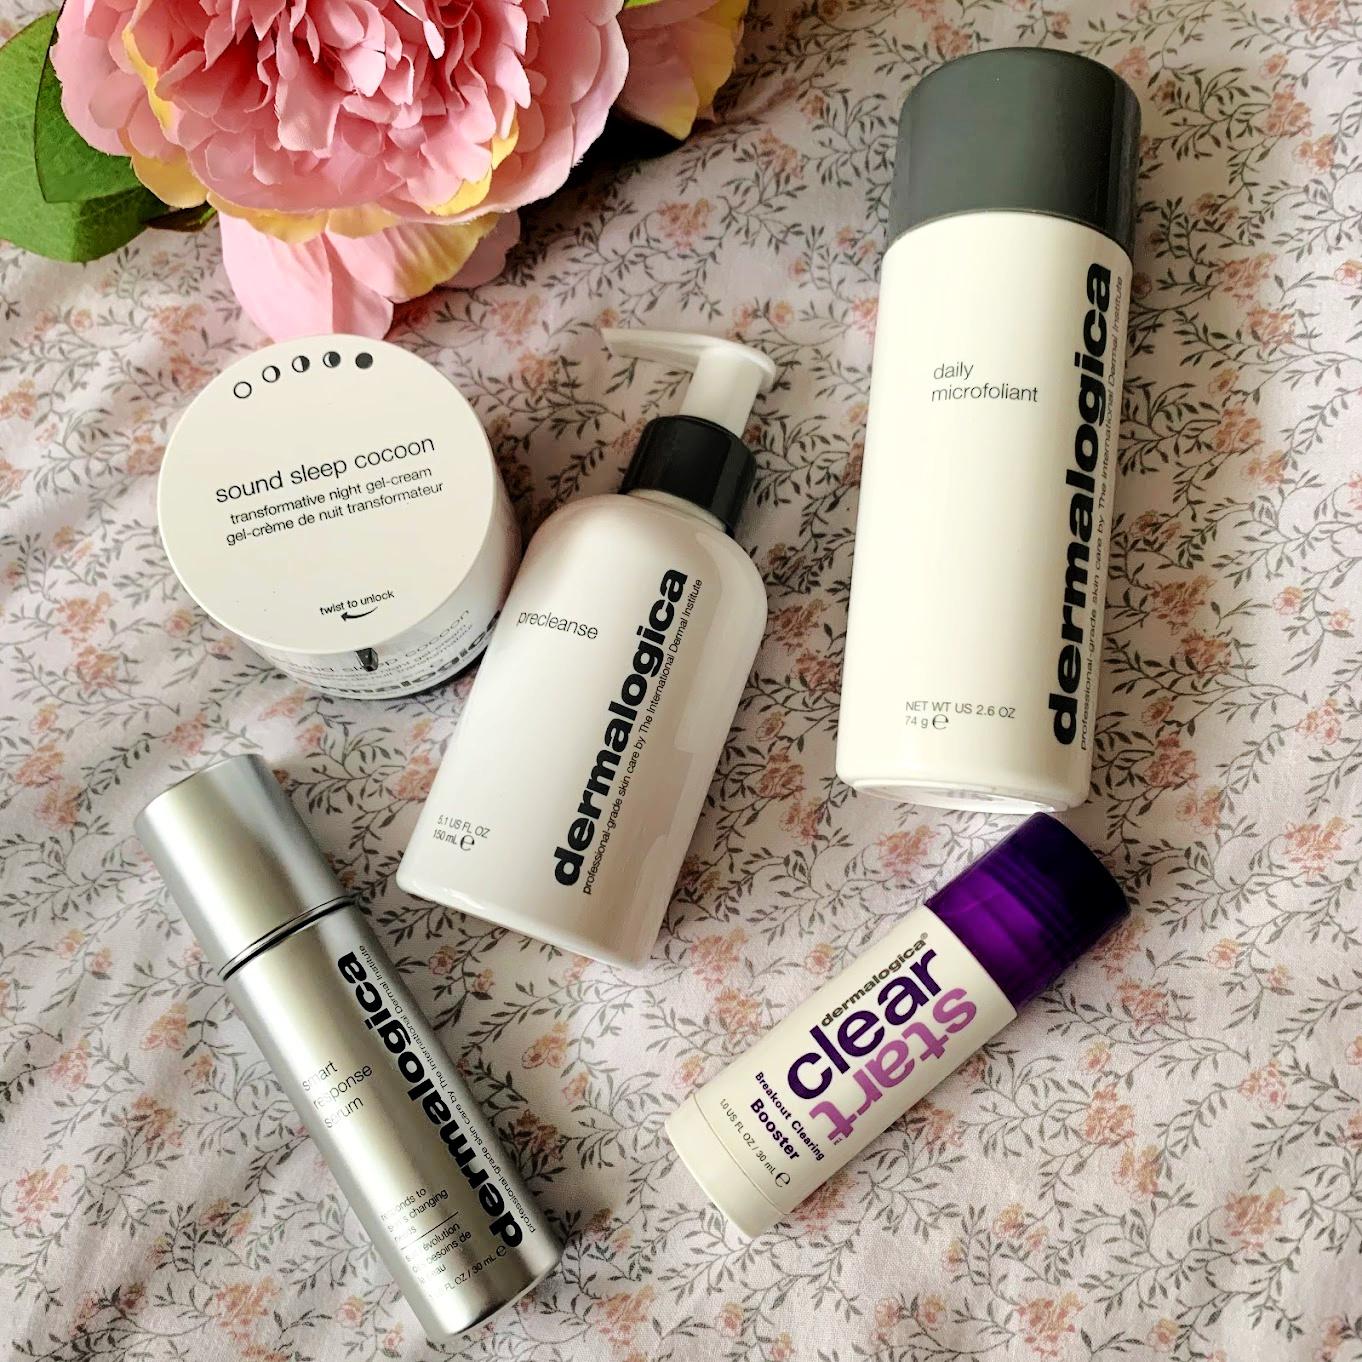 Danielle Levy, Dermalogica, Dermalogica skinfluencer, skincare blogger, beauty blogger, Liverpool blogger, Wirral blogger,